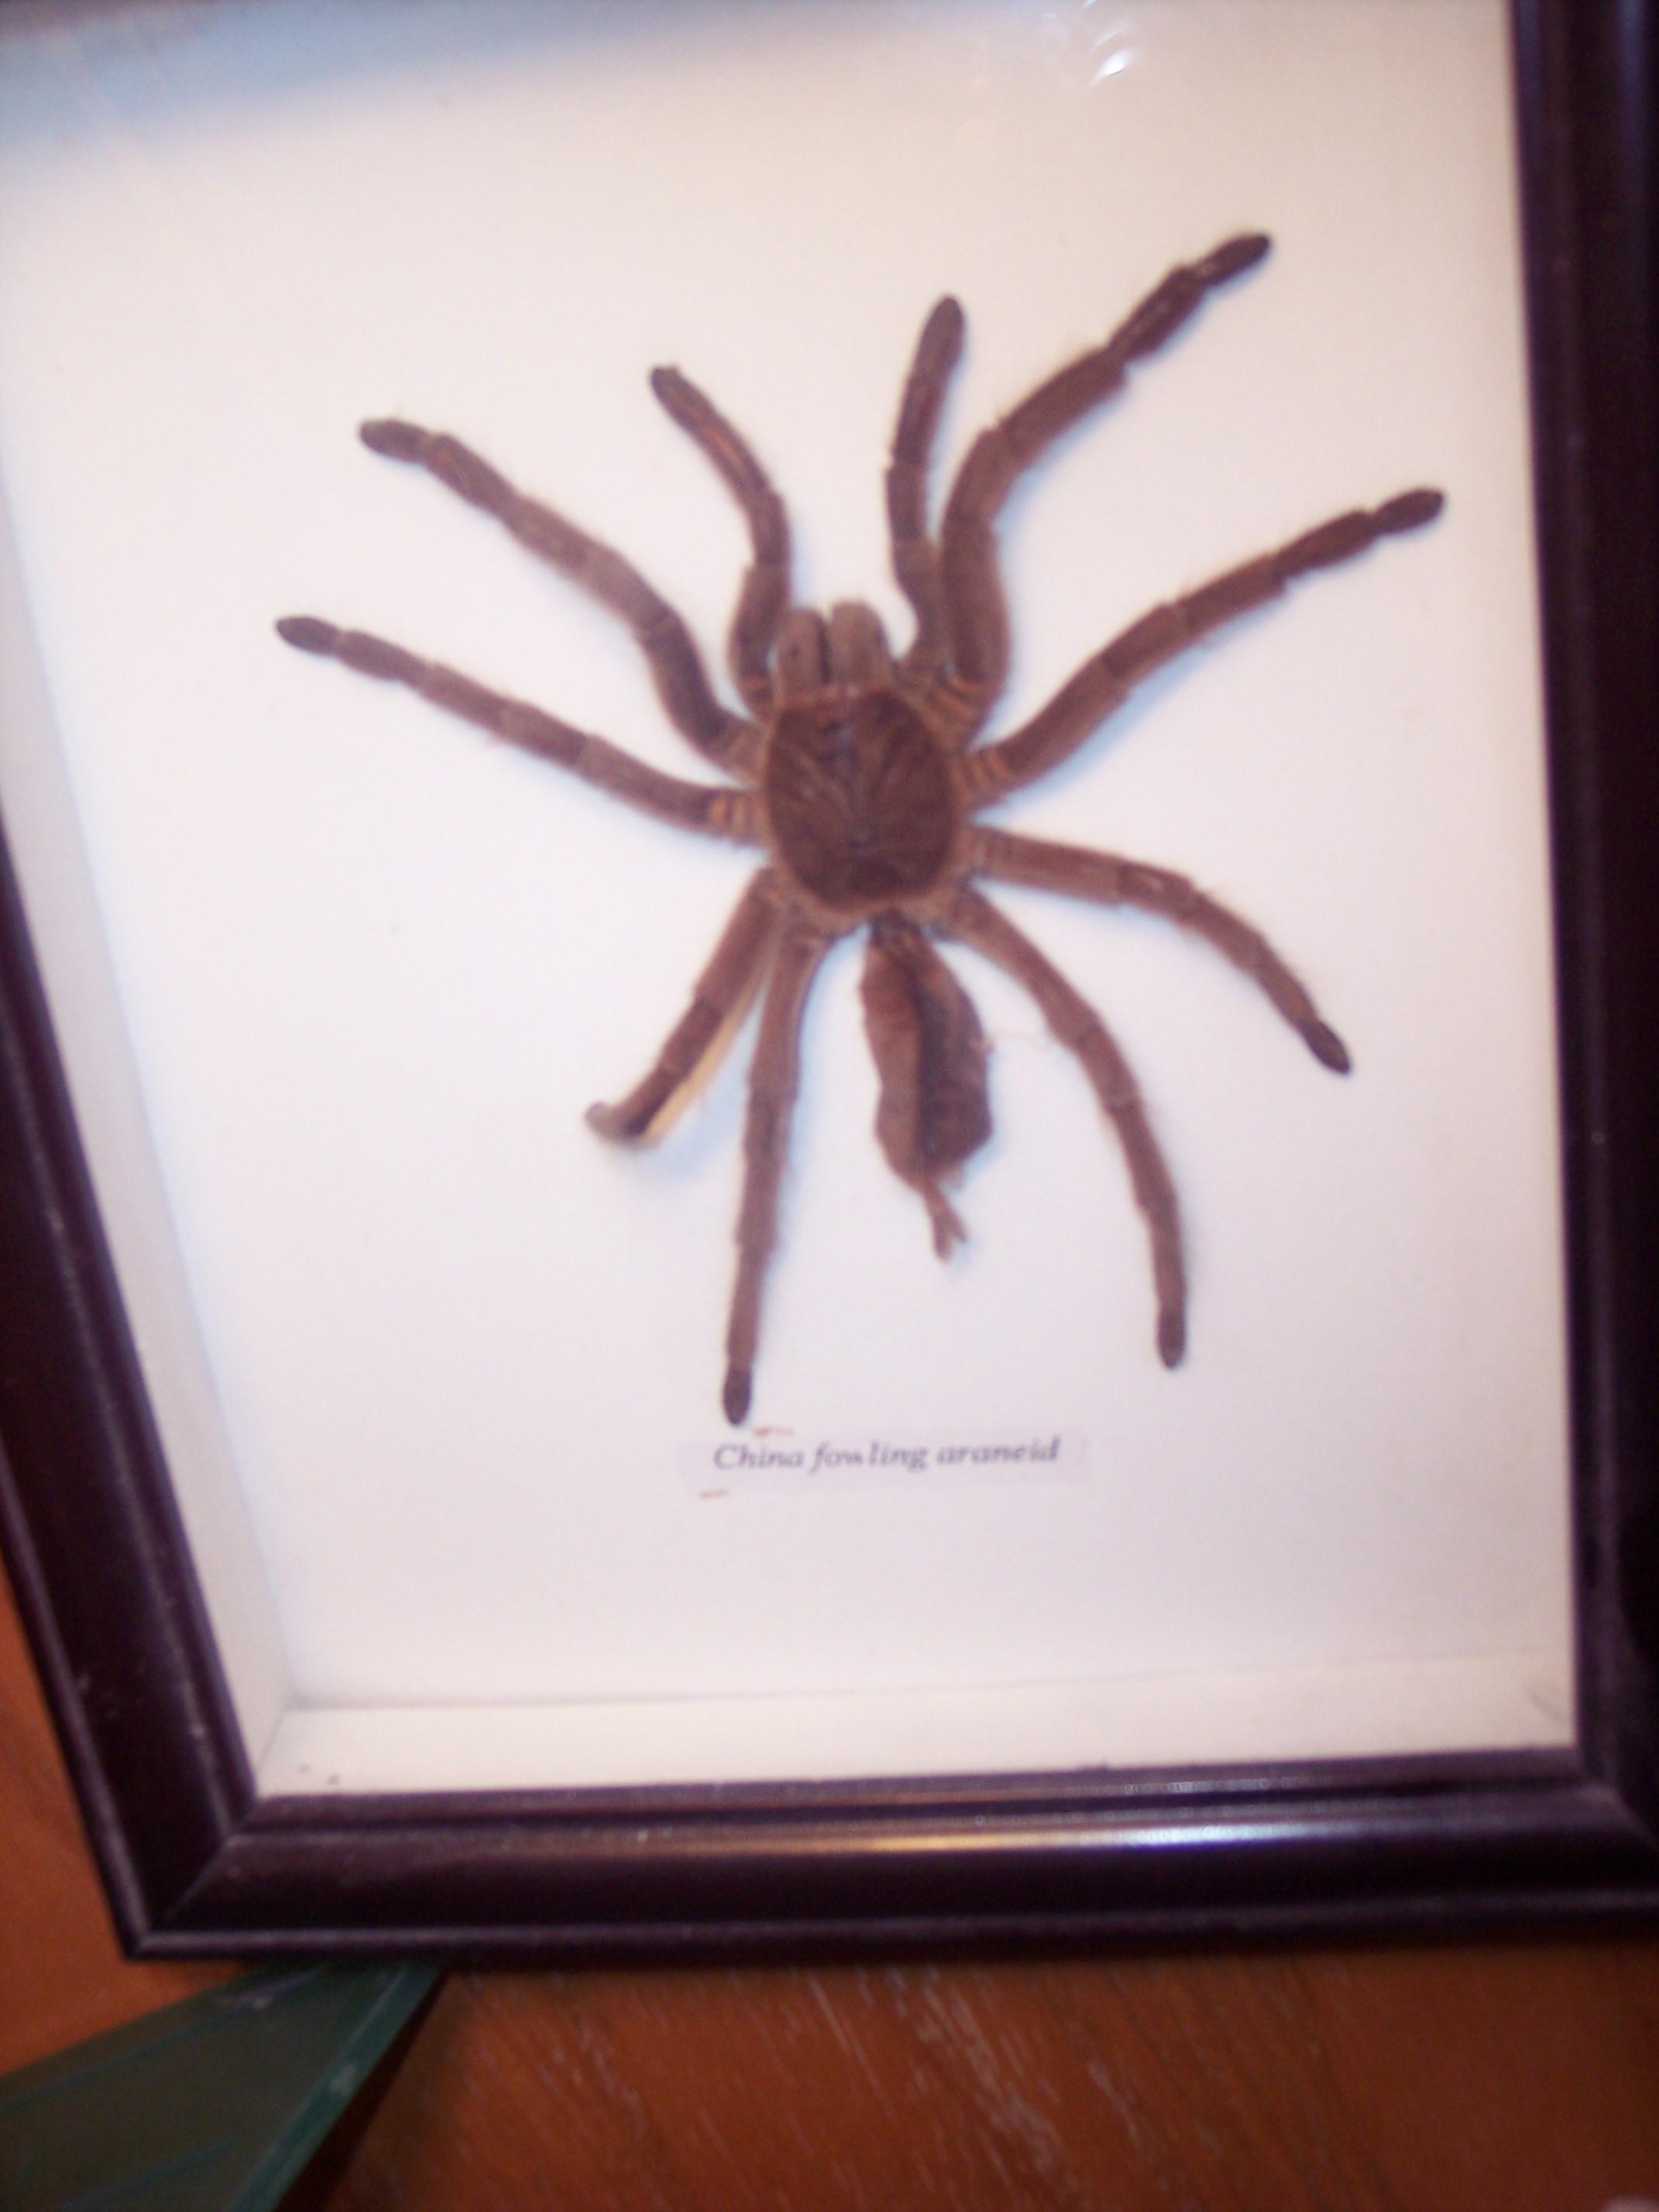 Stoker, the spider